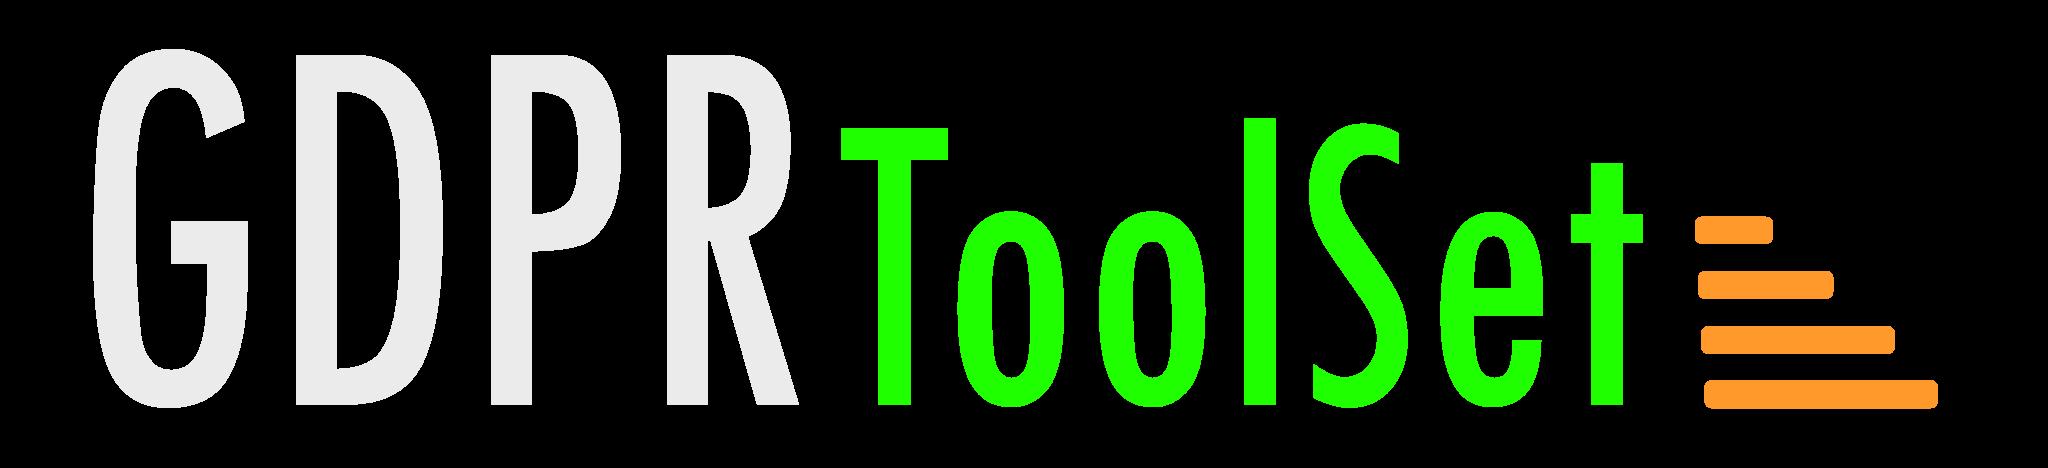 GDPR Tool Set